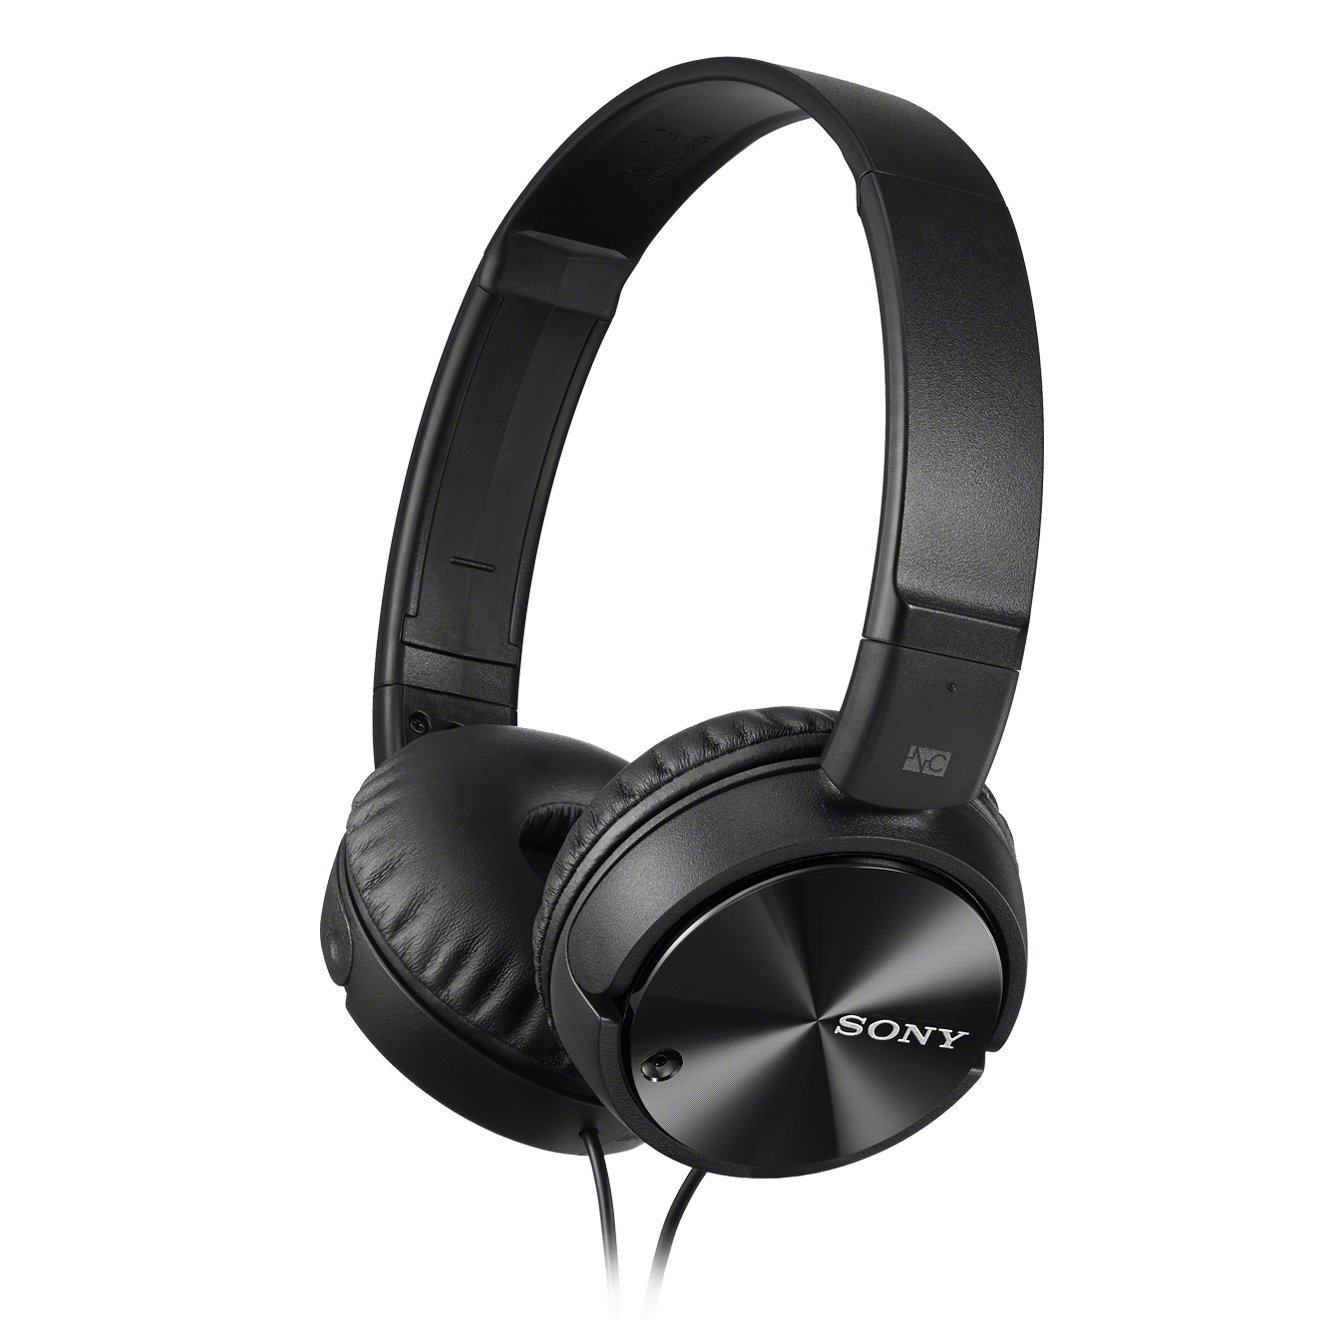 Sony Kopfhörer amazon